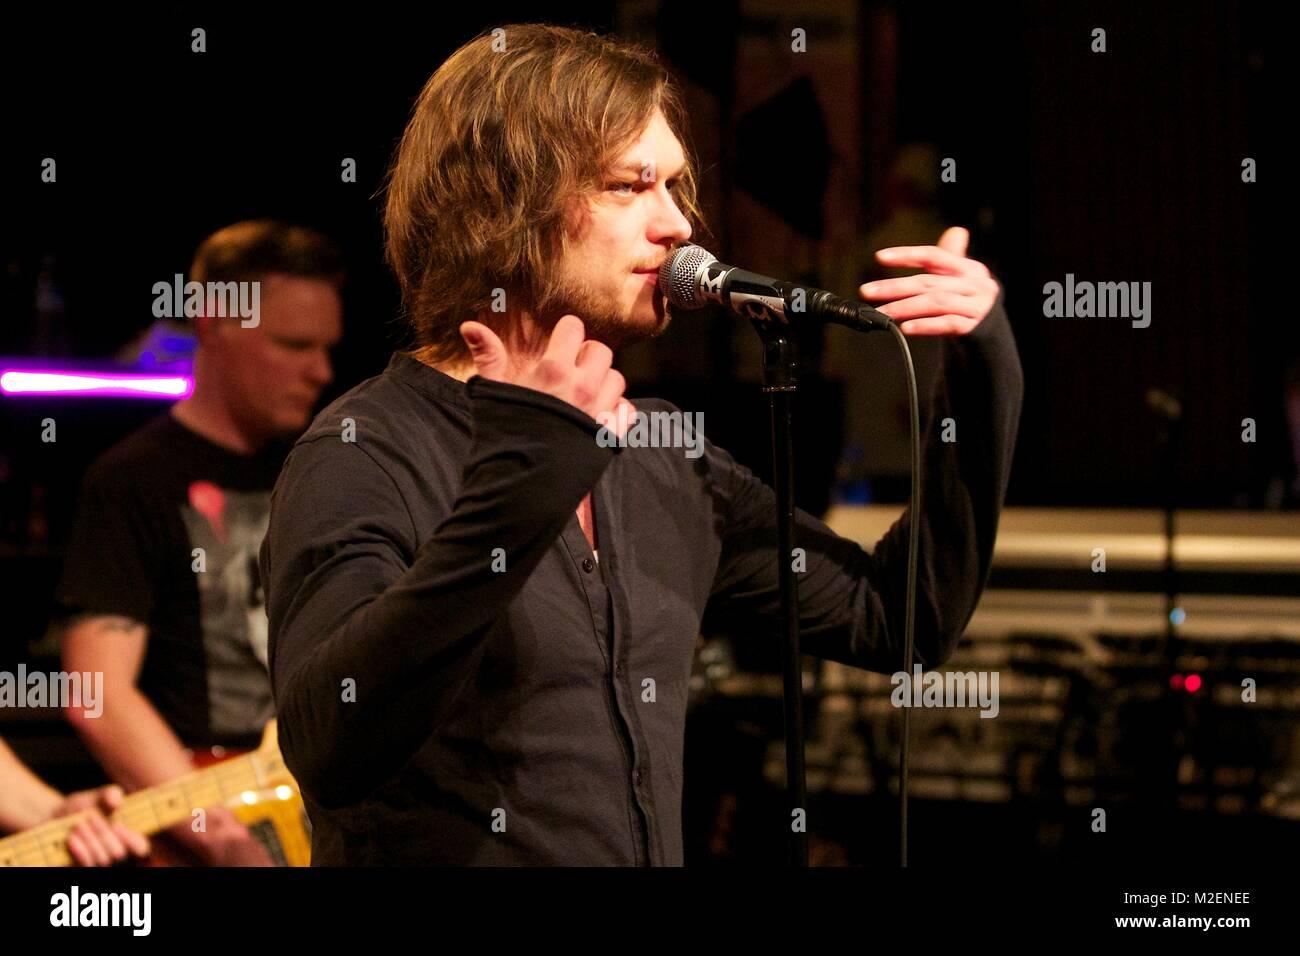 Thomas Godoj (* 6. März 1978 in Rybnik, Polen; gebürtig Tomasz Jacek Godoj) ist ein deutscher Pop/Rock-Sänger und Stock Photo